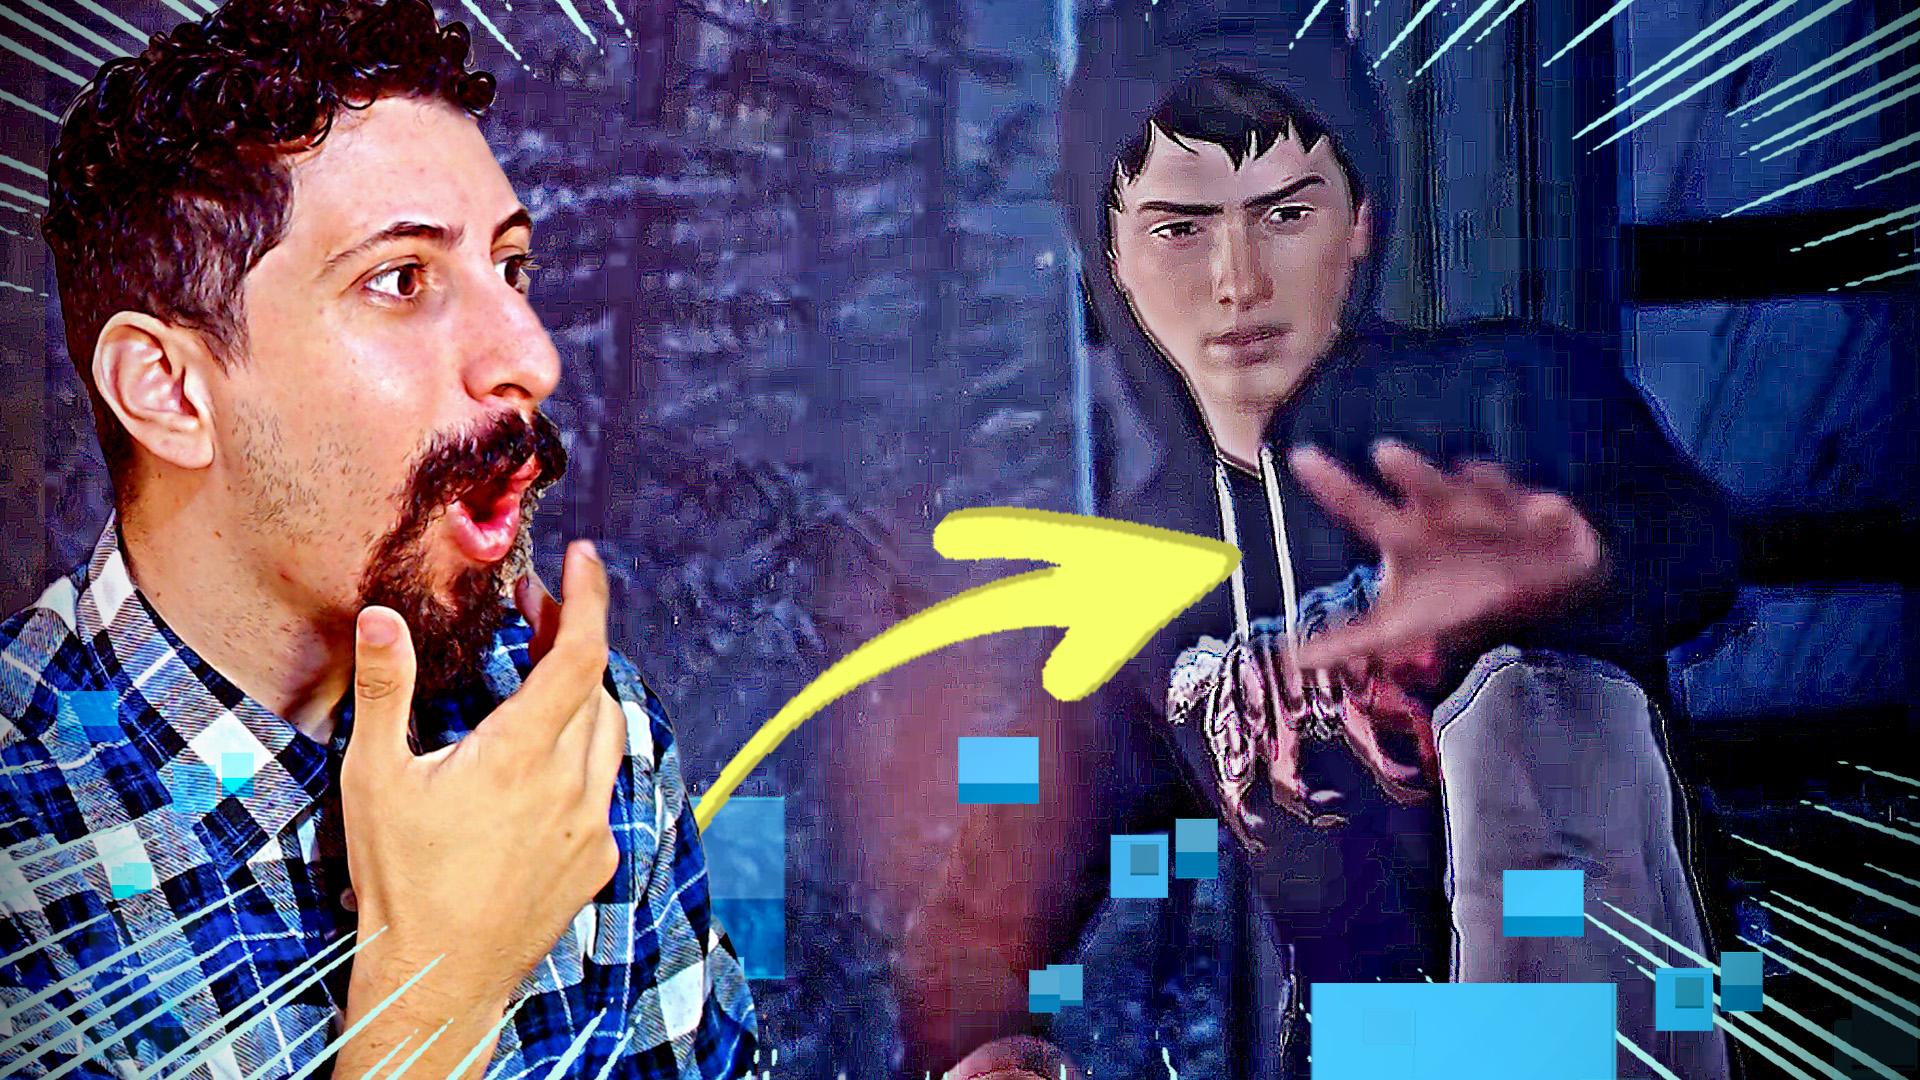 Sean tem poderes?! Teoria de Life is Strange 2 para o episódio 4